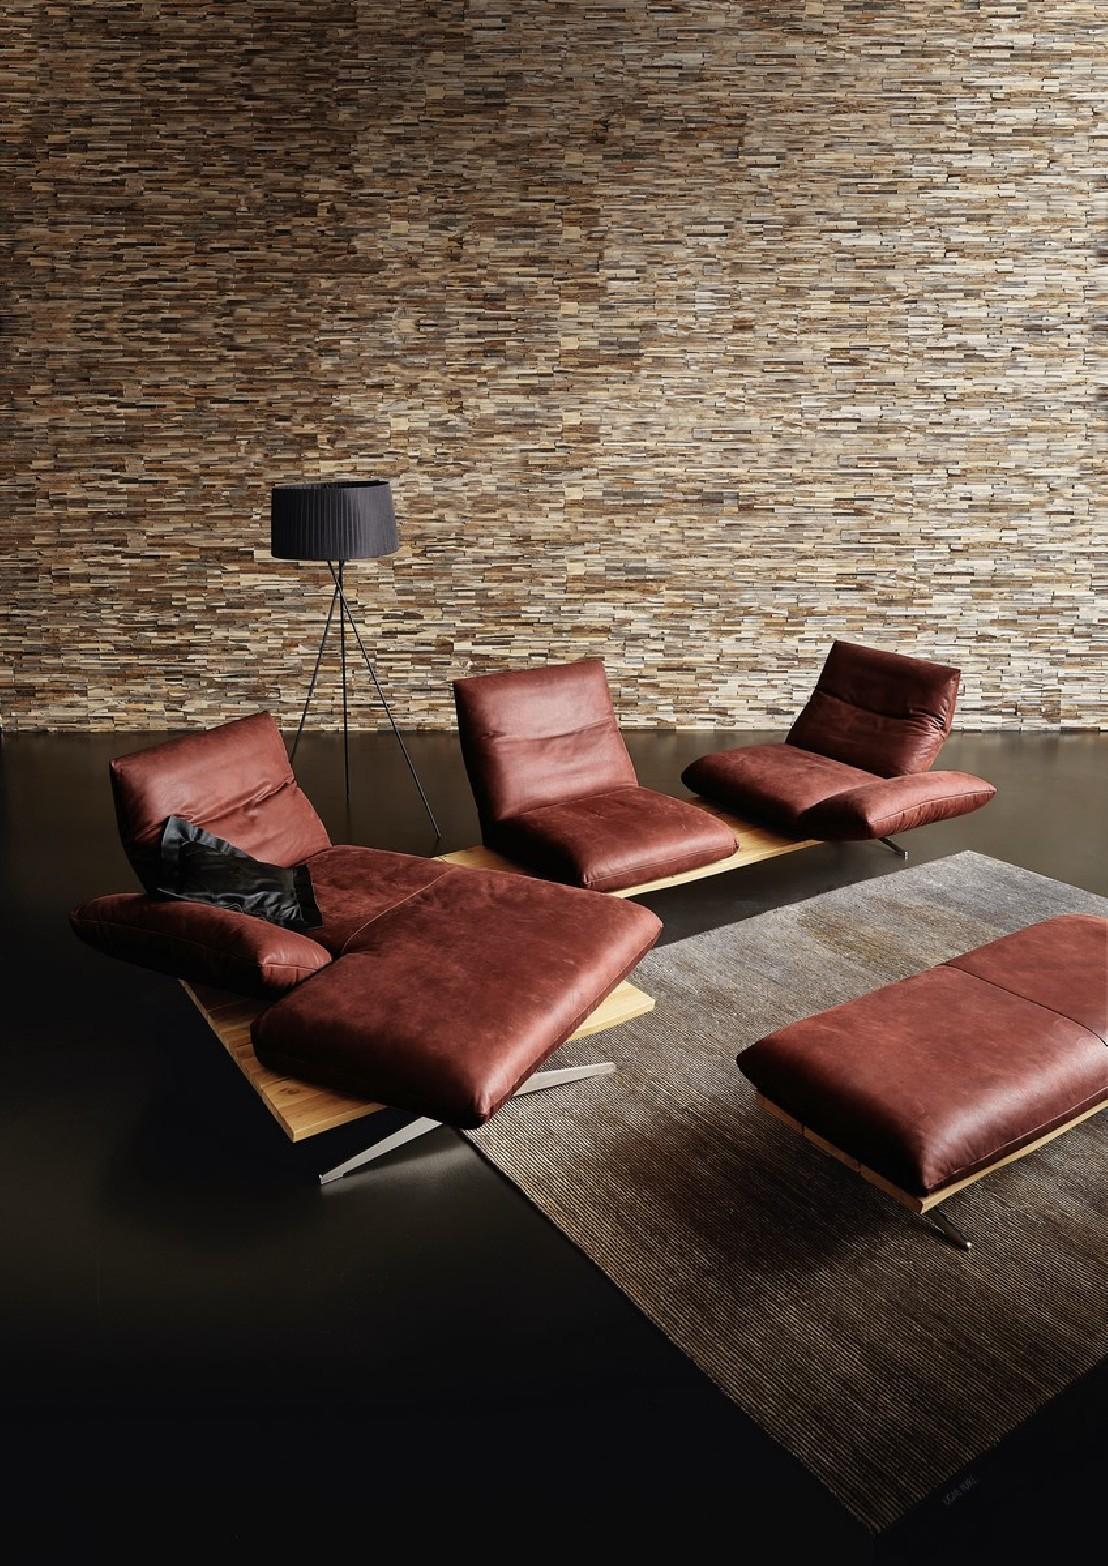 Canap chaise longue ultra design cuir HYPEnKEYS